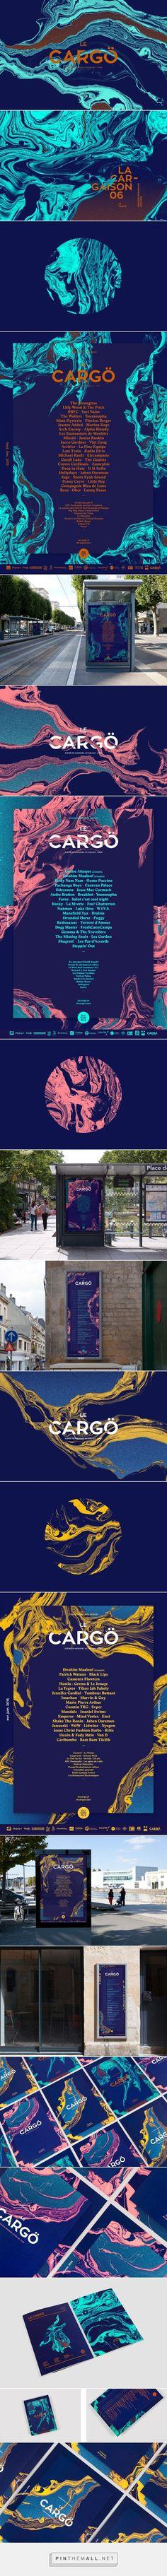 Le Cargö Concert Hall Branding by Murmure